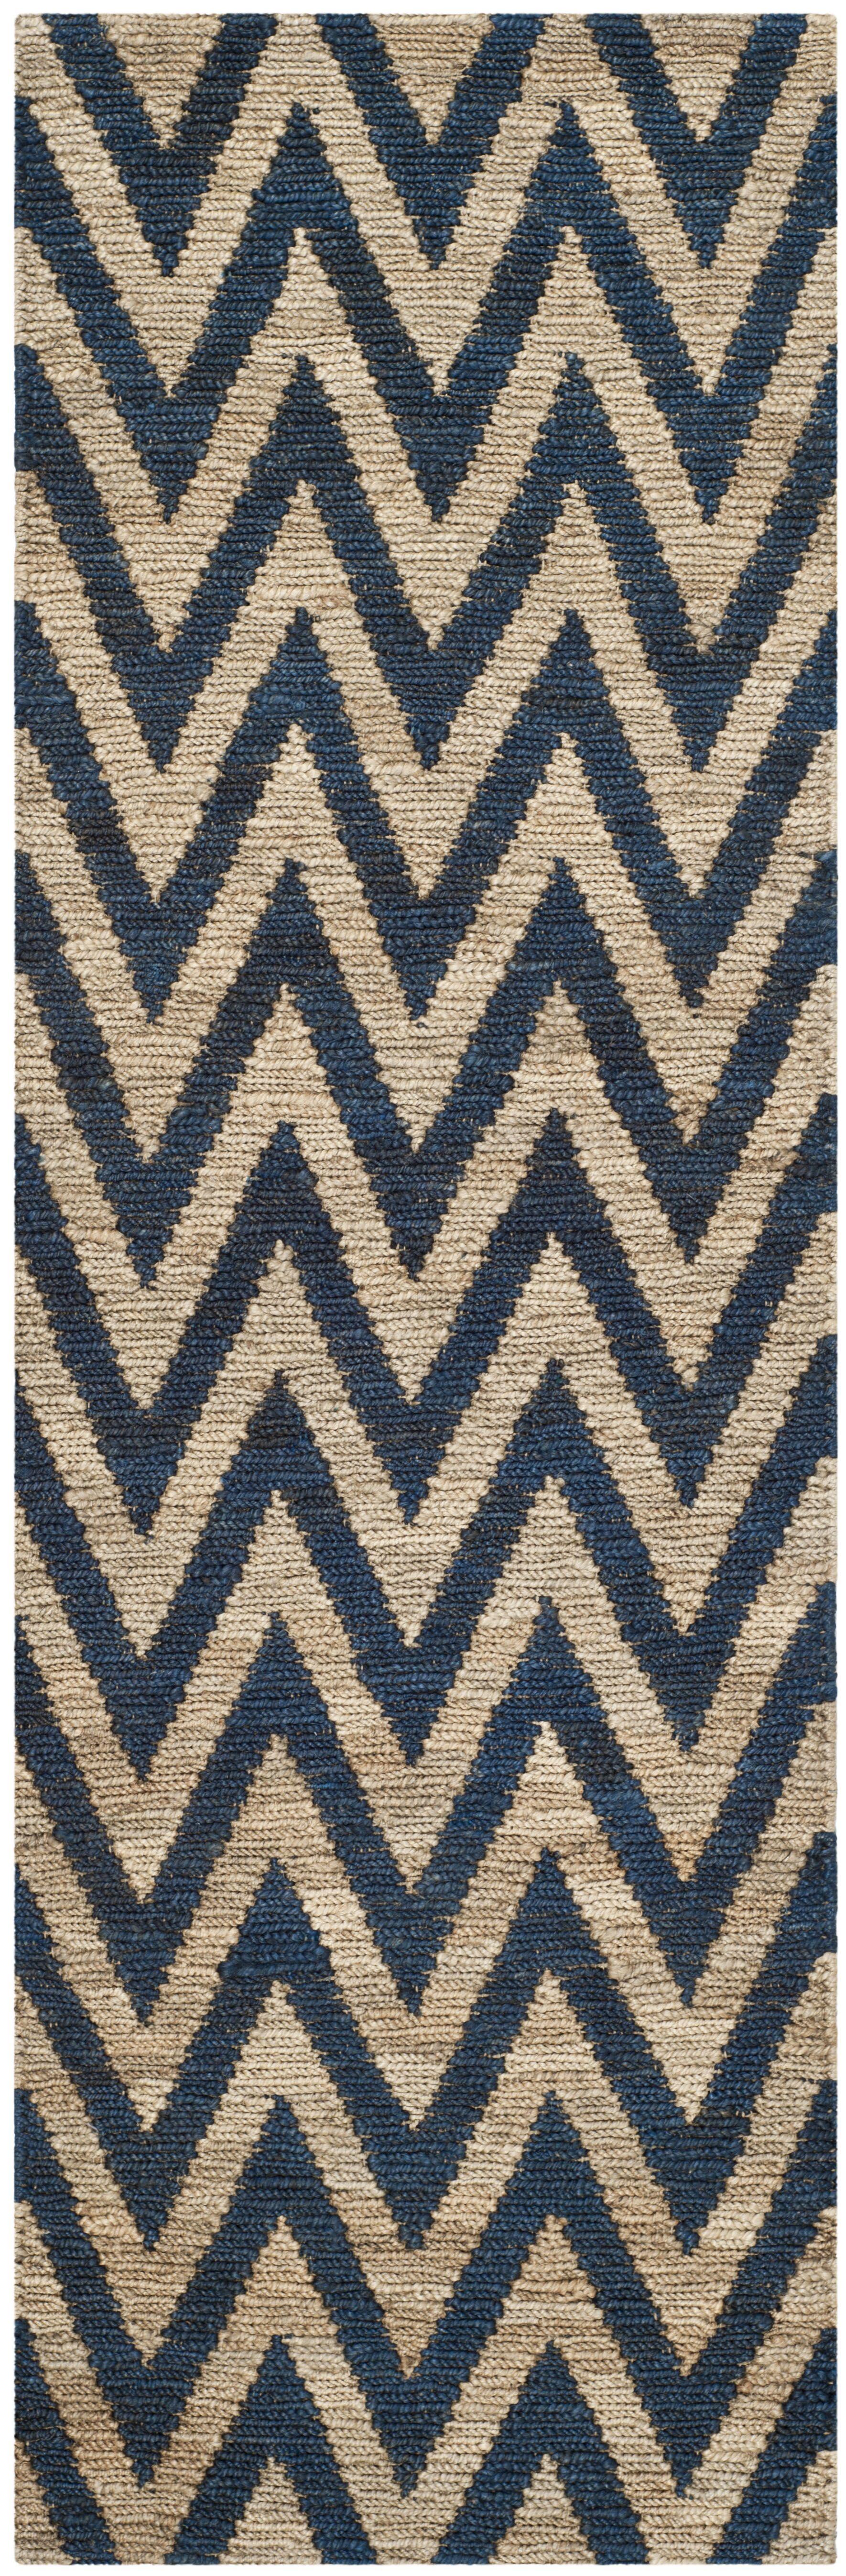 Garman Blue/Natural Original Area Rug Rug Size: Rectangle 6' x 9'